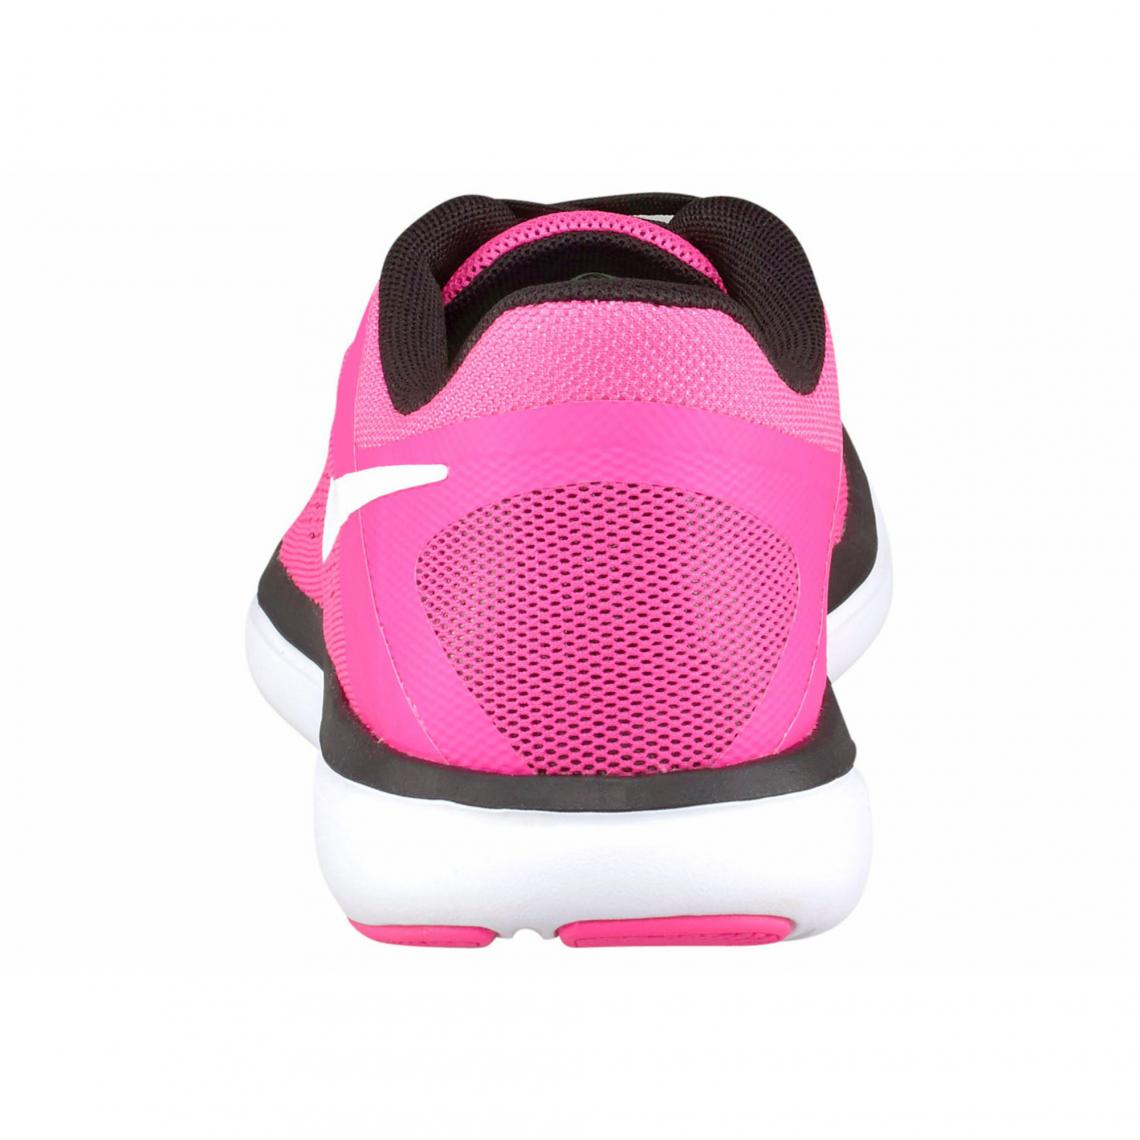 Rose Femme Running Blanc Nike De Rn Chaussures 3suisses 2016 Flex sthQdrC